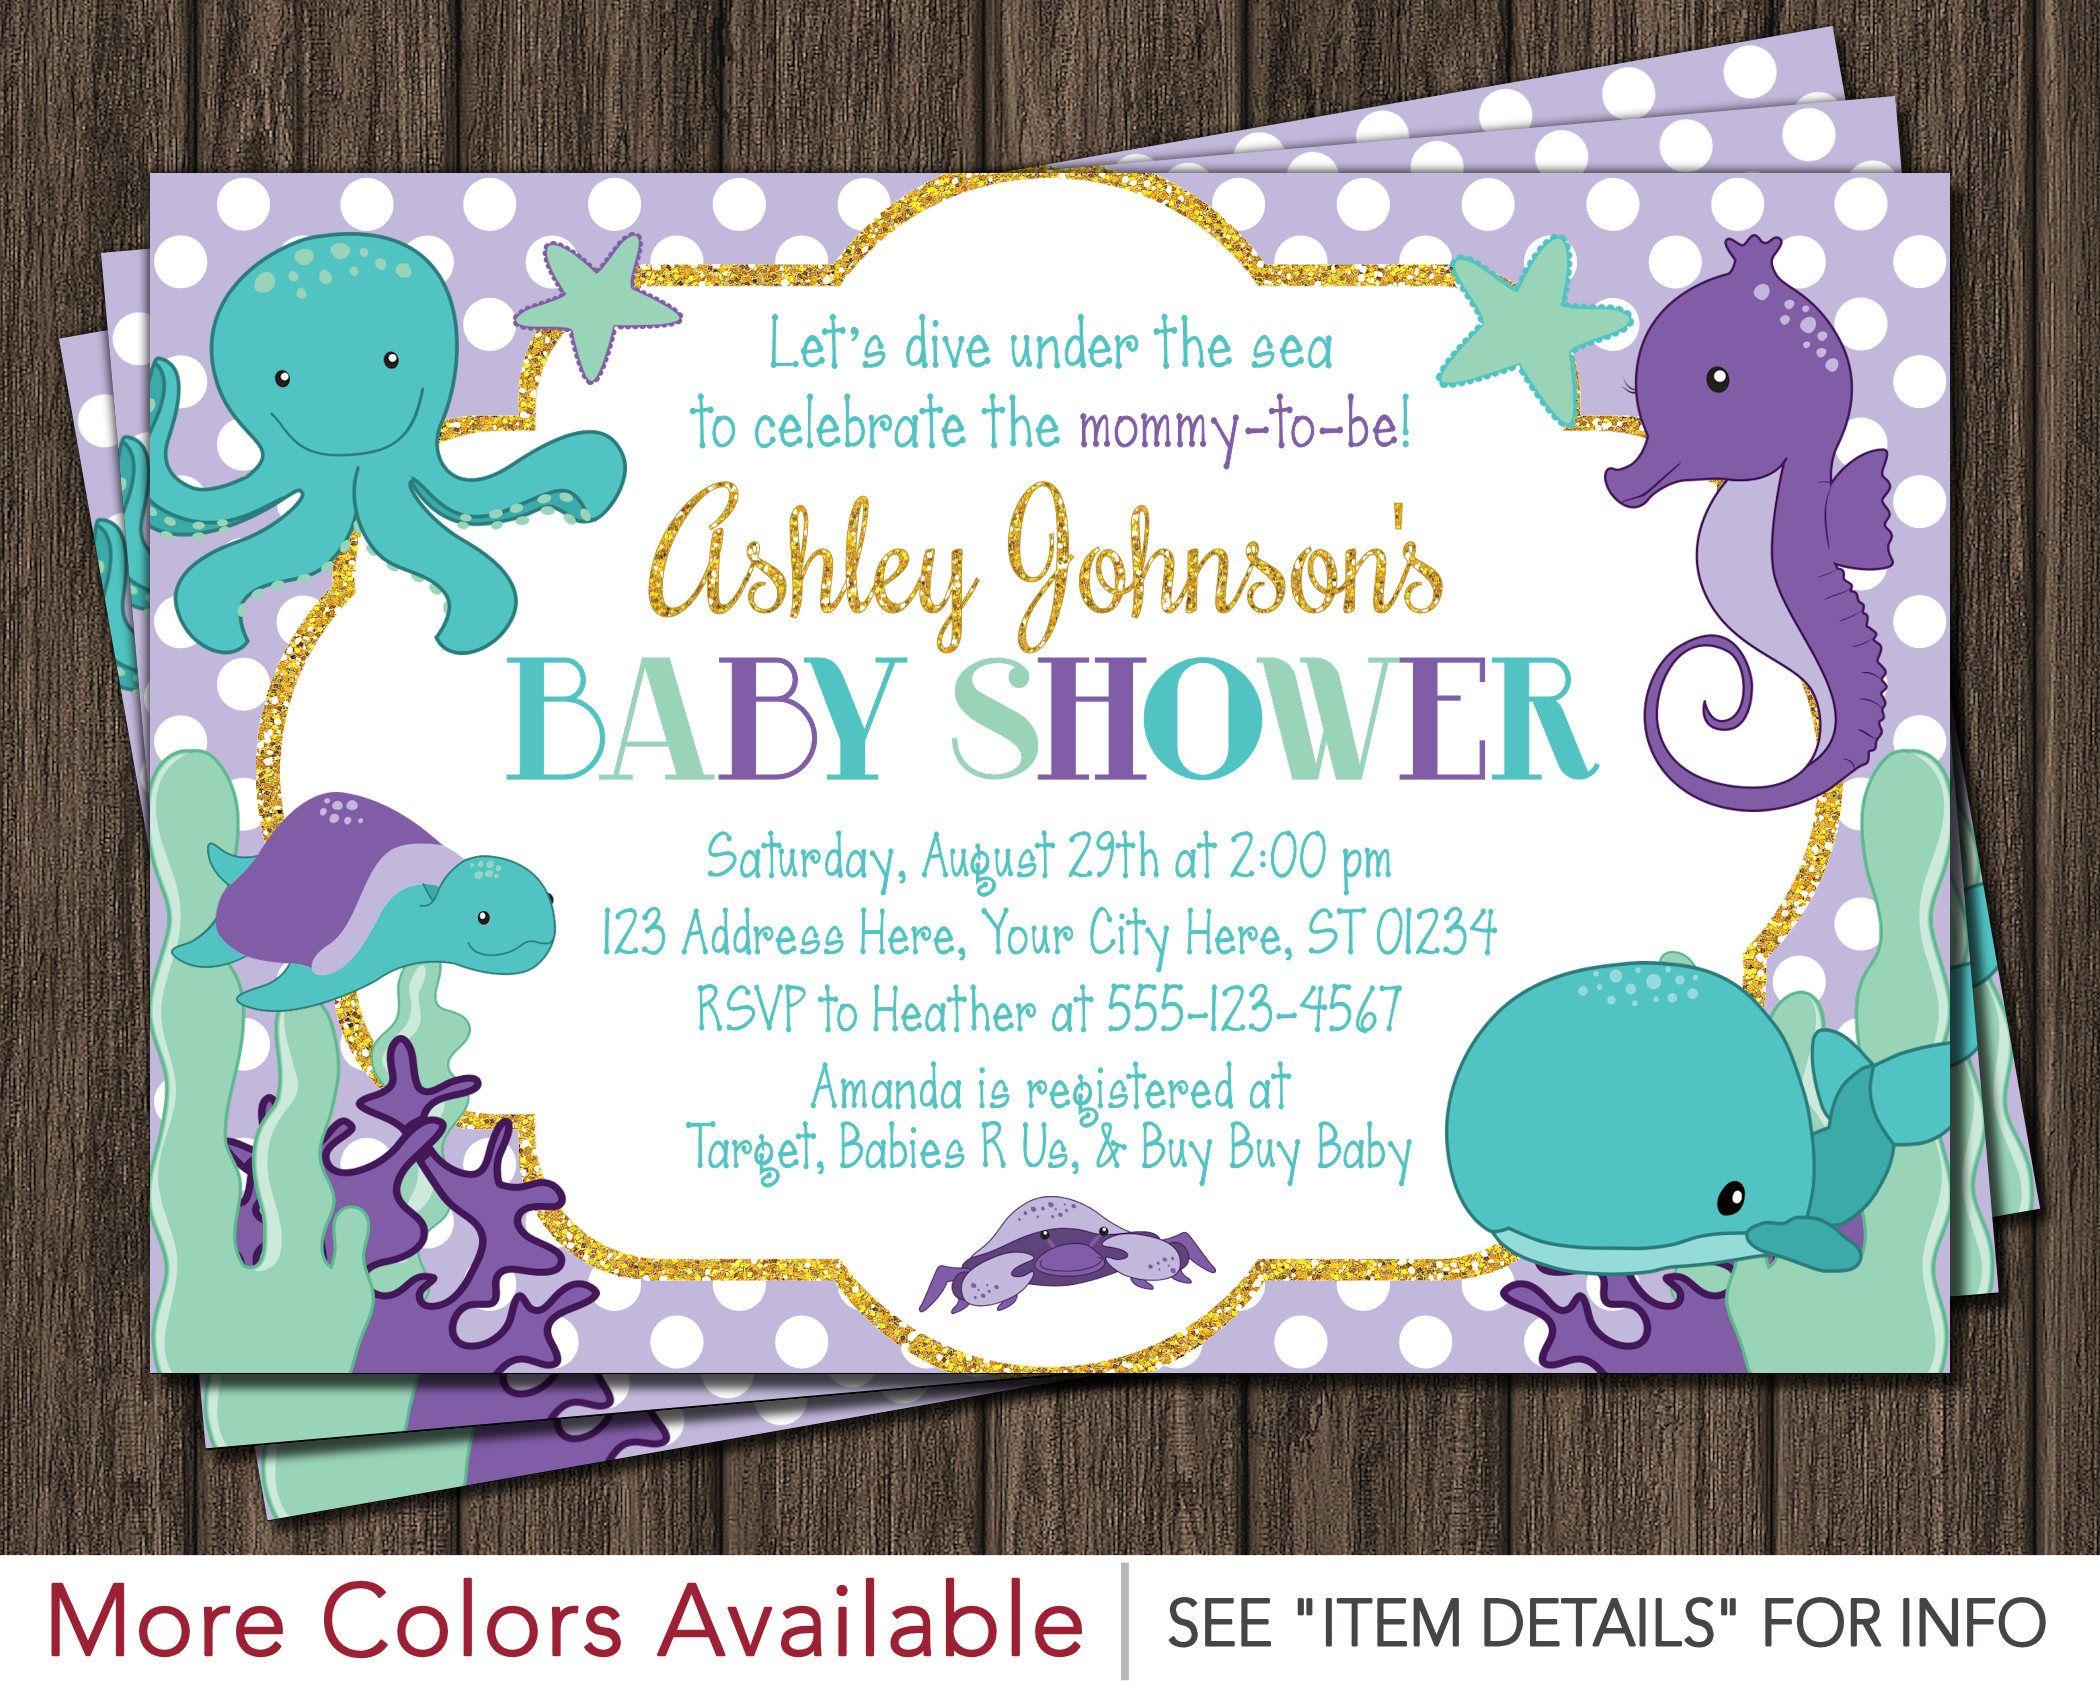 Under the Sea Baby Shower Invitation • Purple, Lavender, Turquoise ...